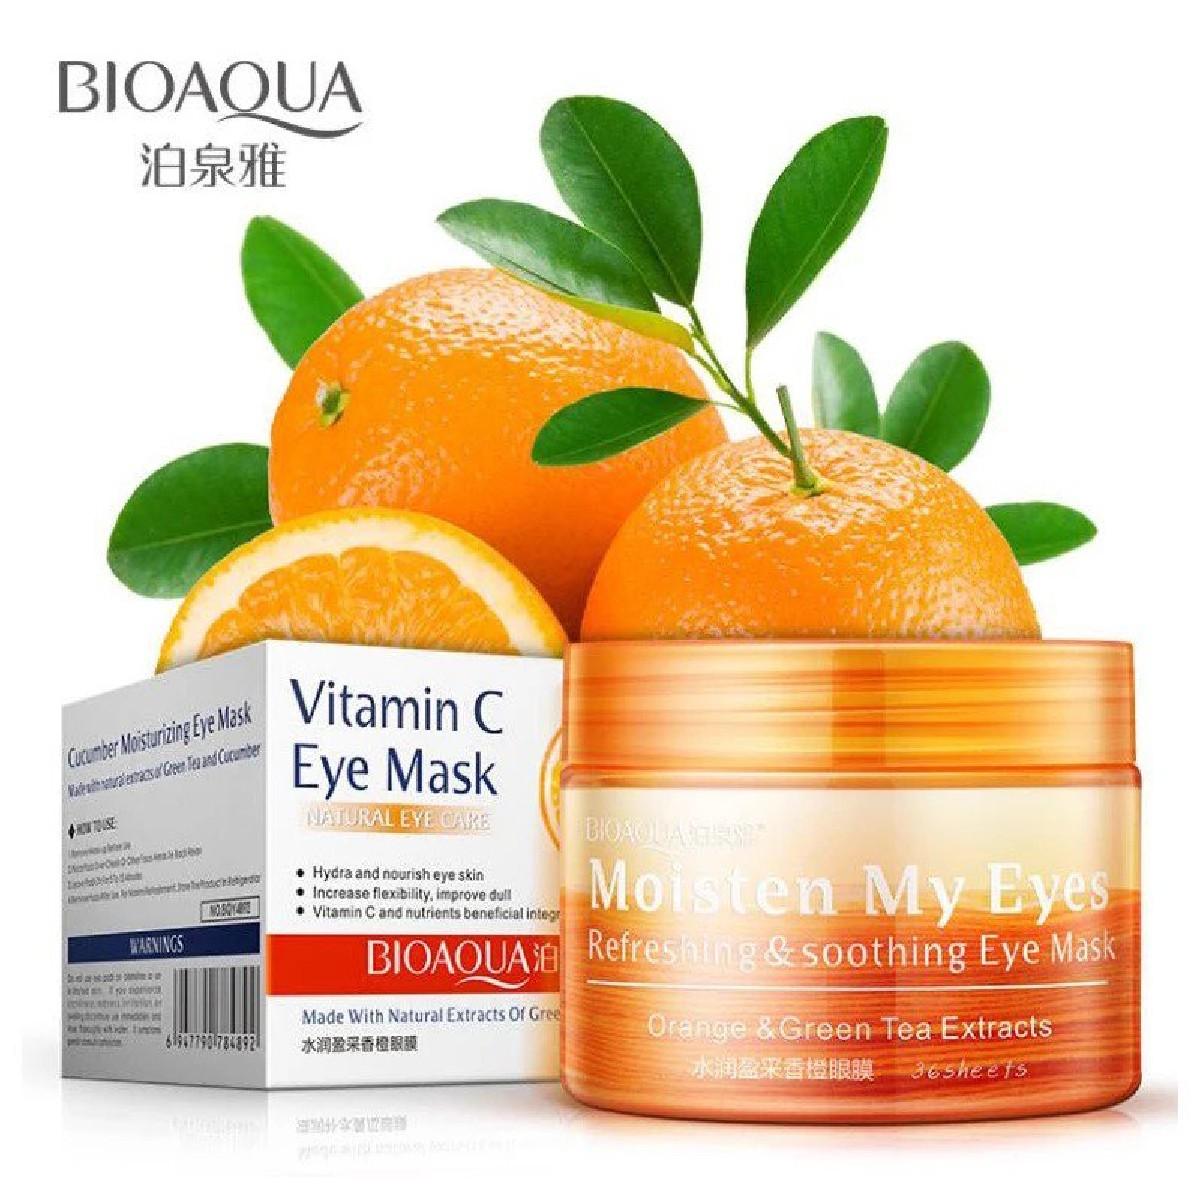 Bioaqua Vitamin C Orange Eye Mask Remove Dark circle Moisturizing Anti-wrinkle Anti-aging Eye Masks 80g - BQY4991